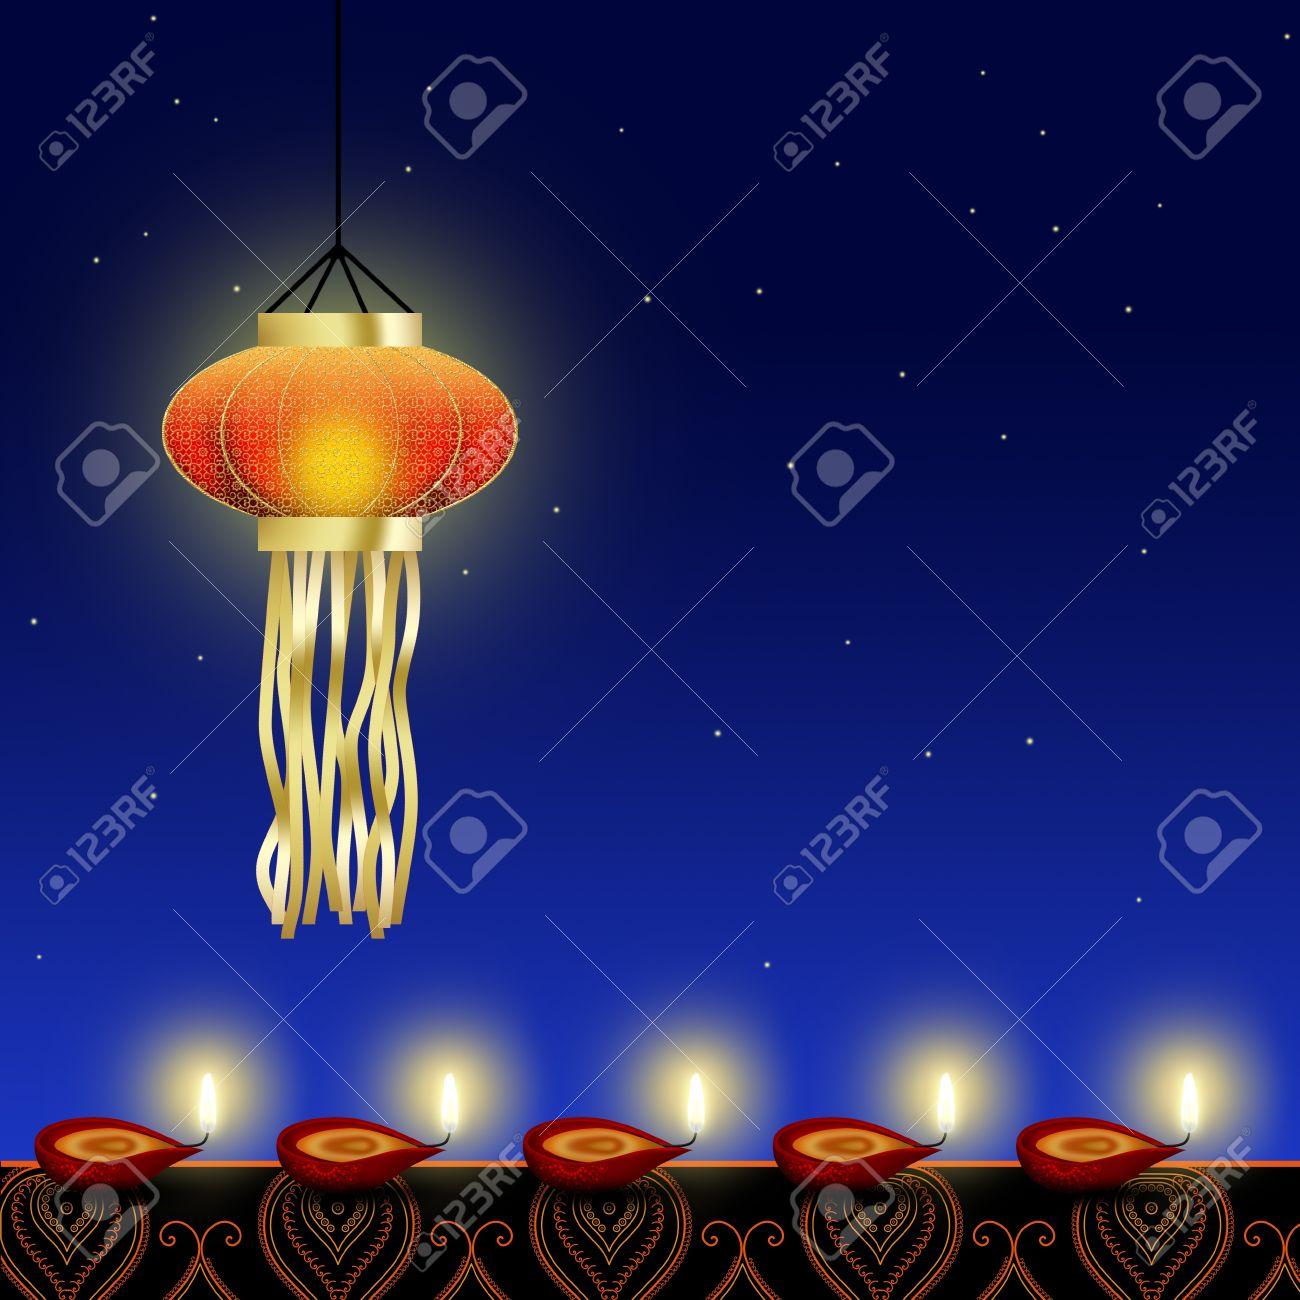 Happy Diwali Illustration A Shiny Diwali Lamp With Red Diyas ... for Diwali Lamps Designs  111bof